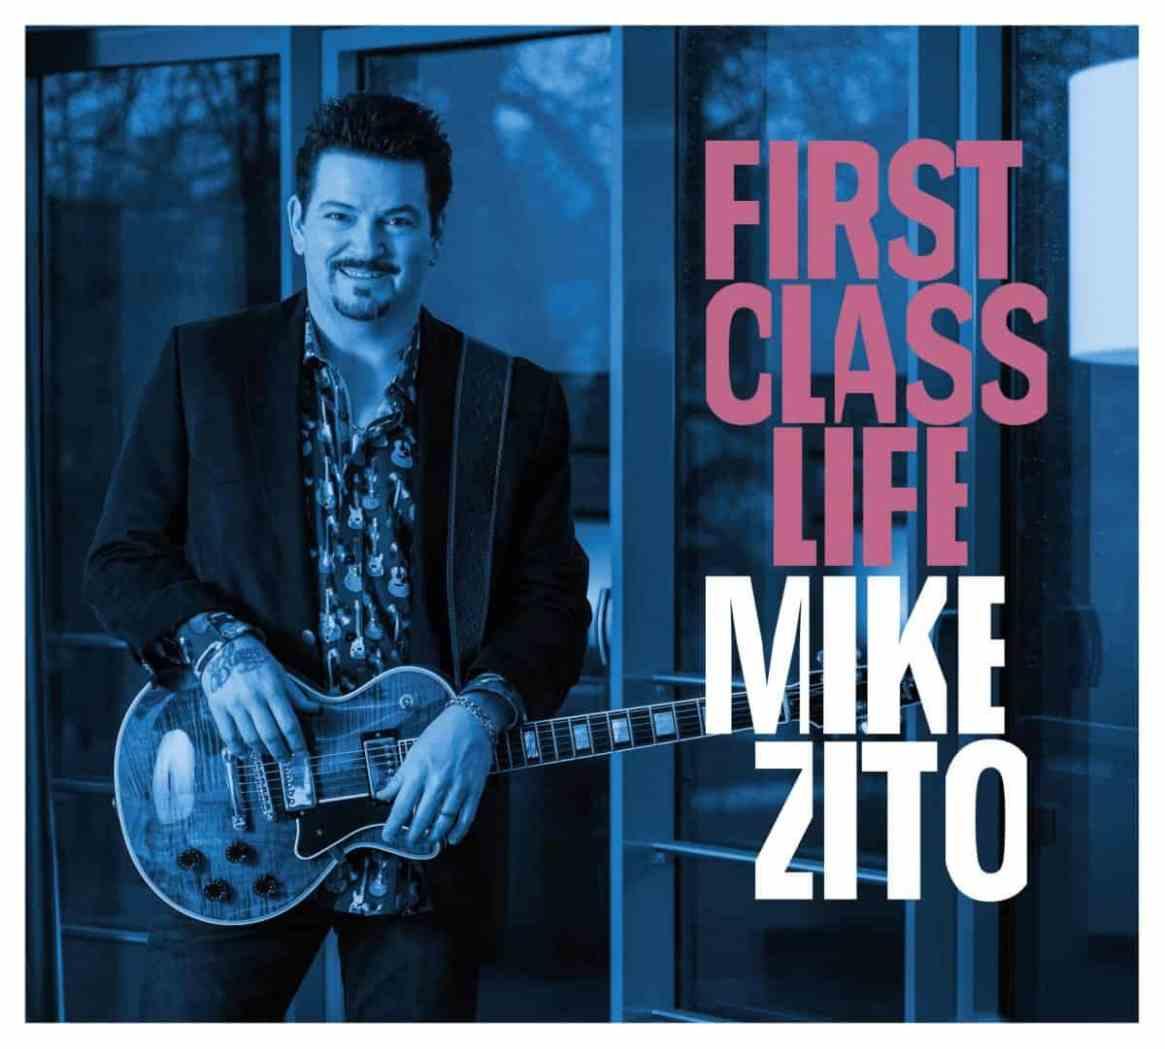 MikeZito-first-class-life-1200x1081 (1)